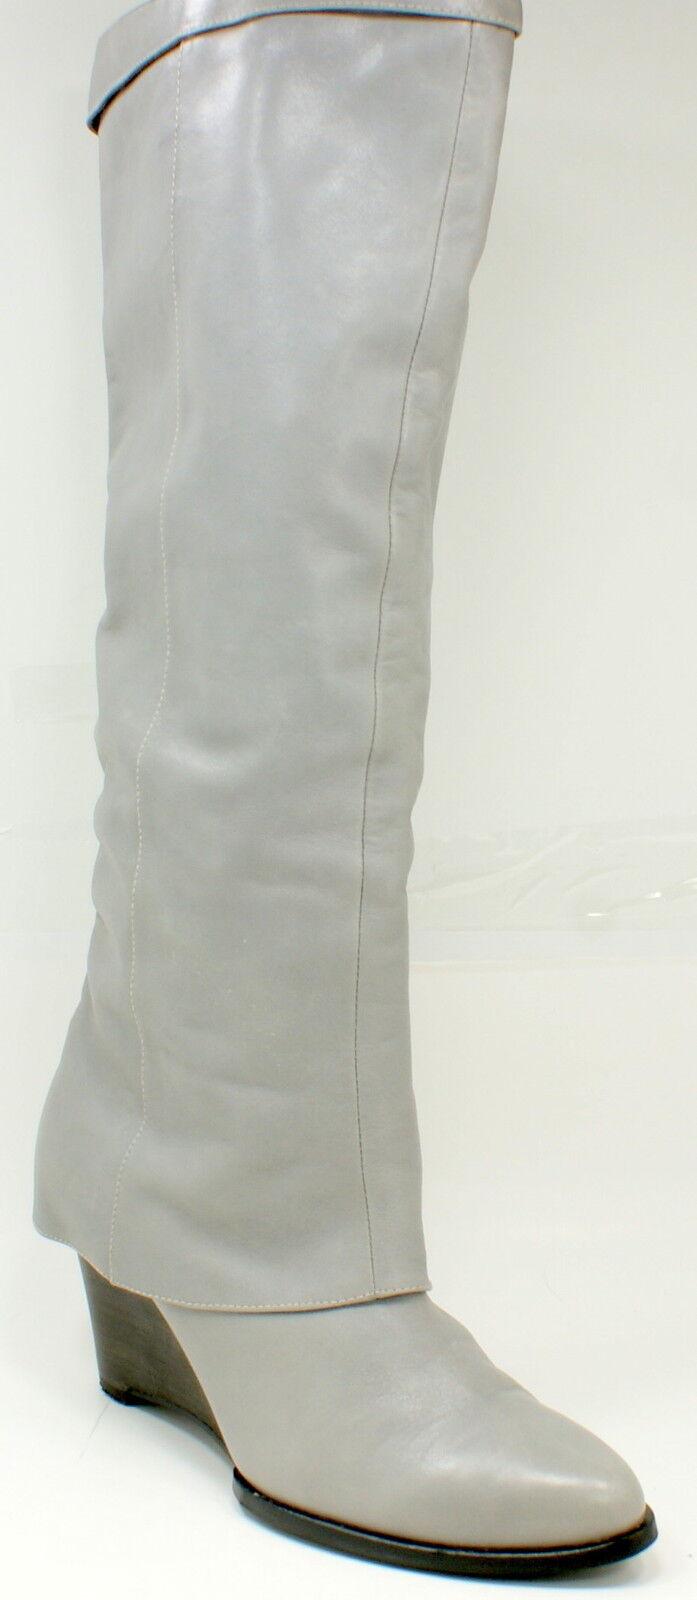 B. makowsky makowsky makowsky Ariana Para mujeres Alto a La Rodilla gris Cuero botas Talla 9.5 M  ventas de salida